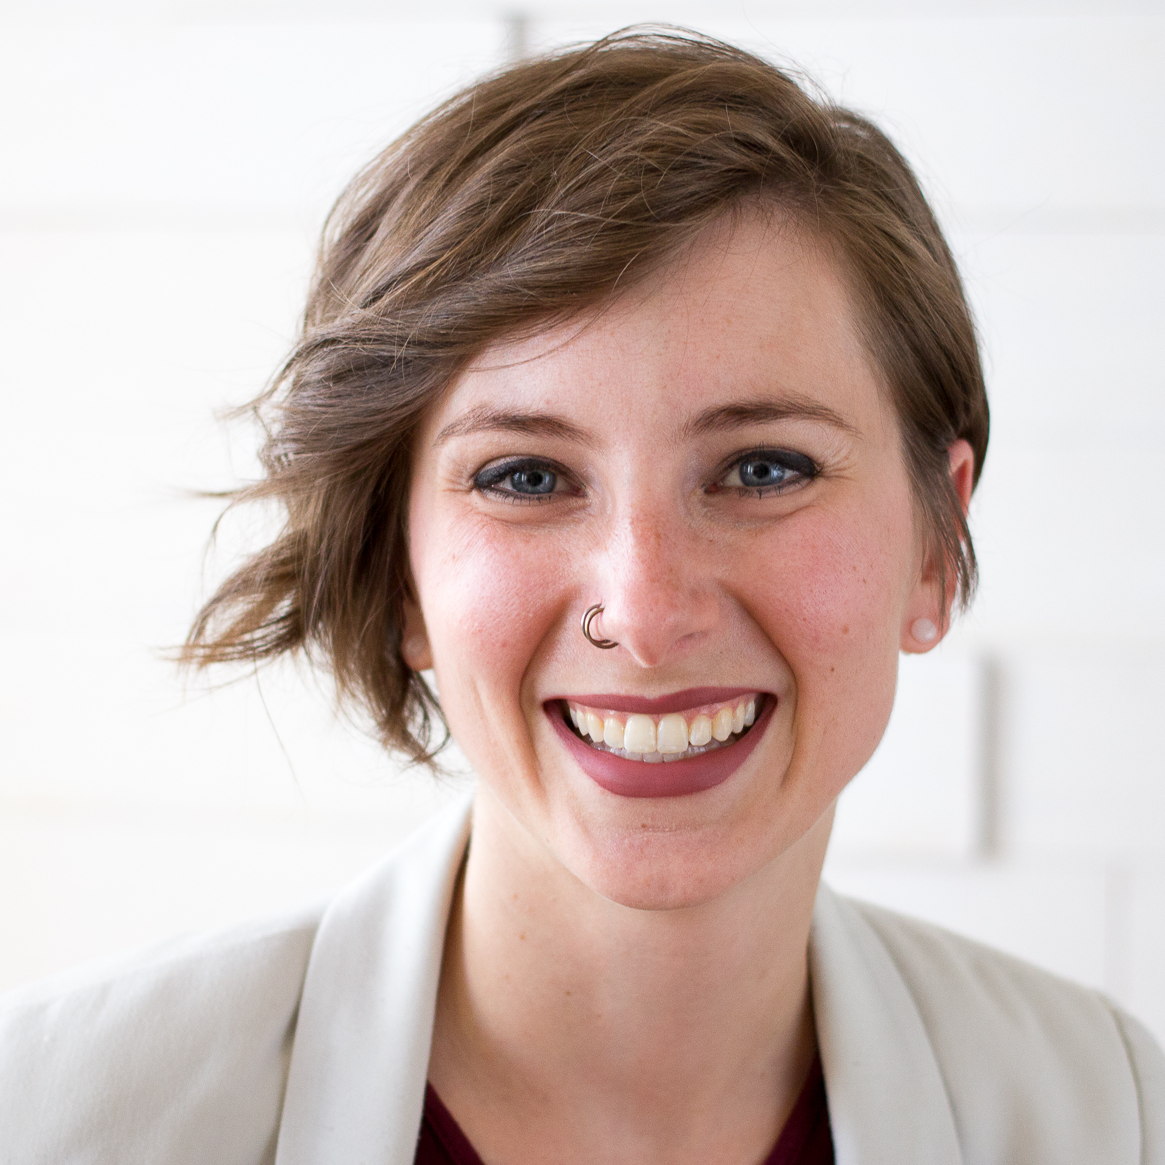 Veronica Kiring, serial entrepreneur and TEDx speaker